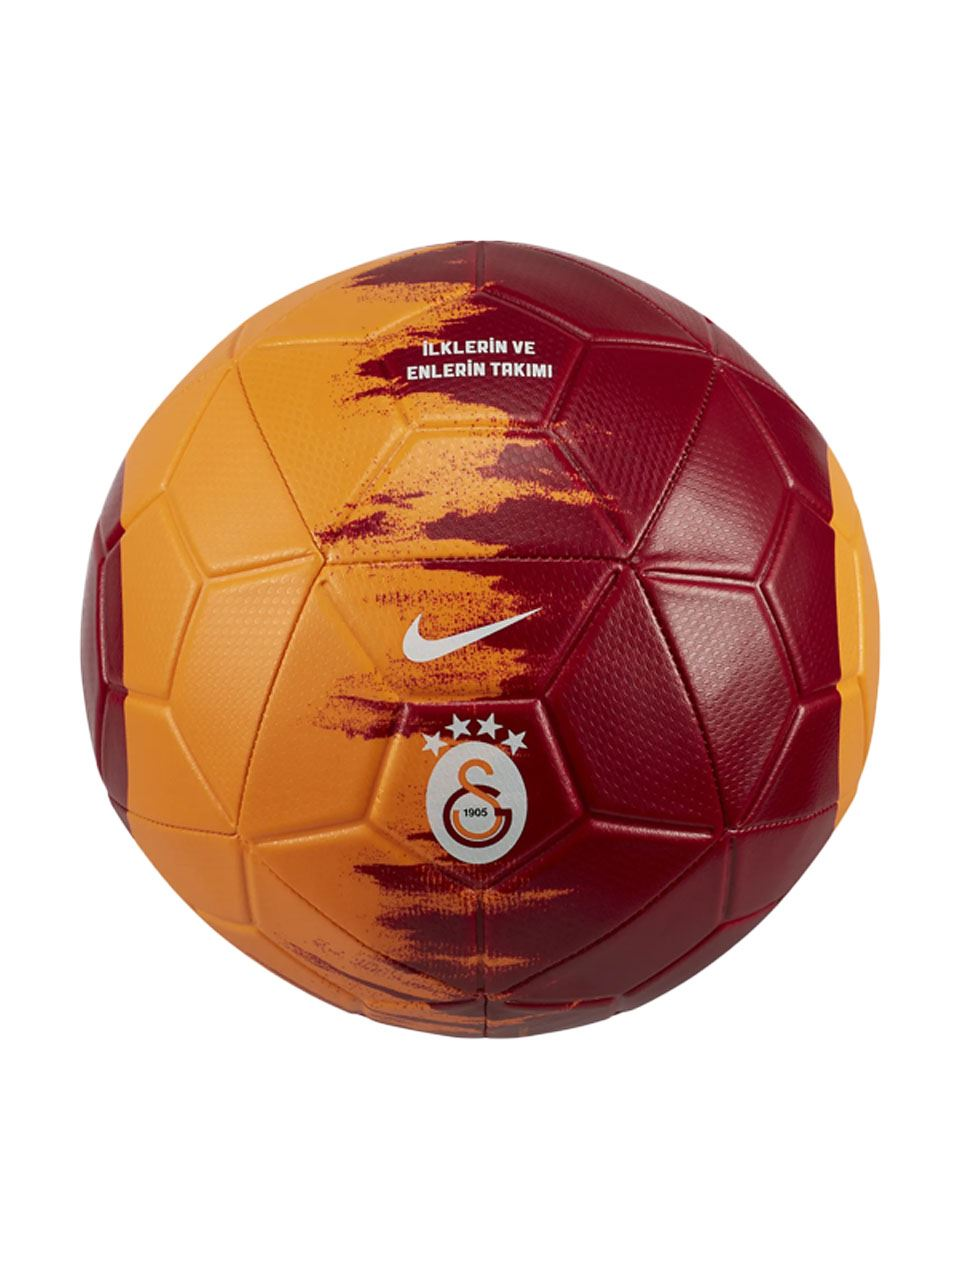 Nıke Galatasaray Futbol Topu Cq7885-836